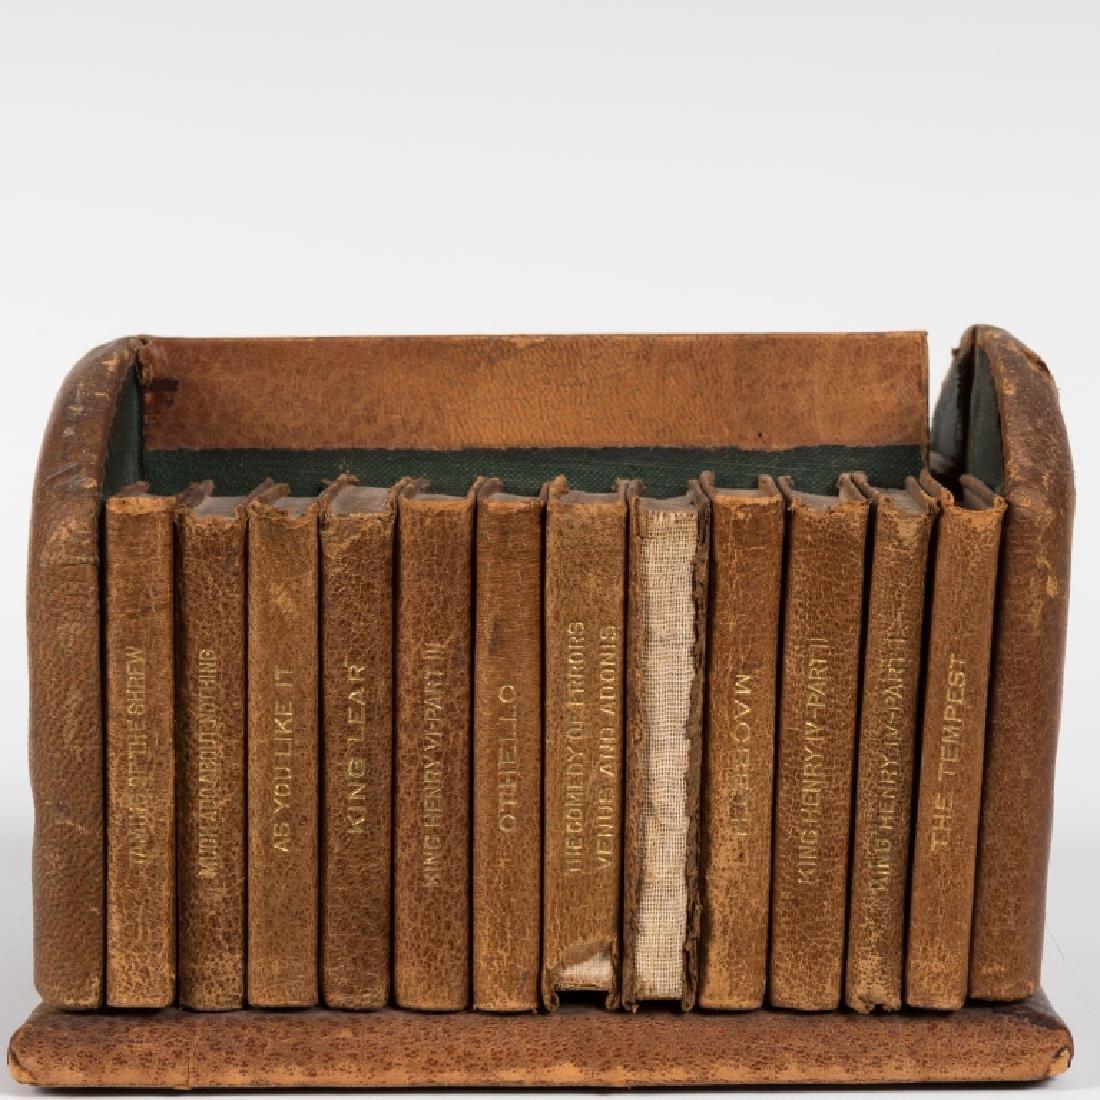 Shakespeare Miniature Set Leather Books - 24 Vol - 2